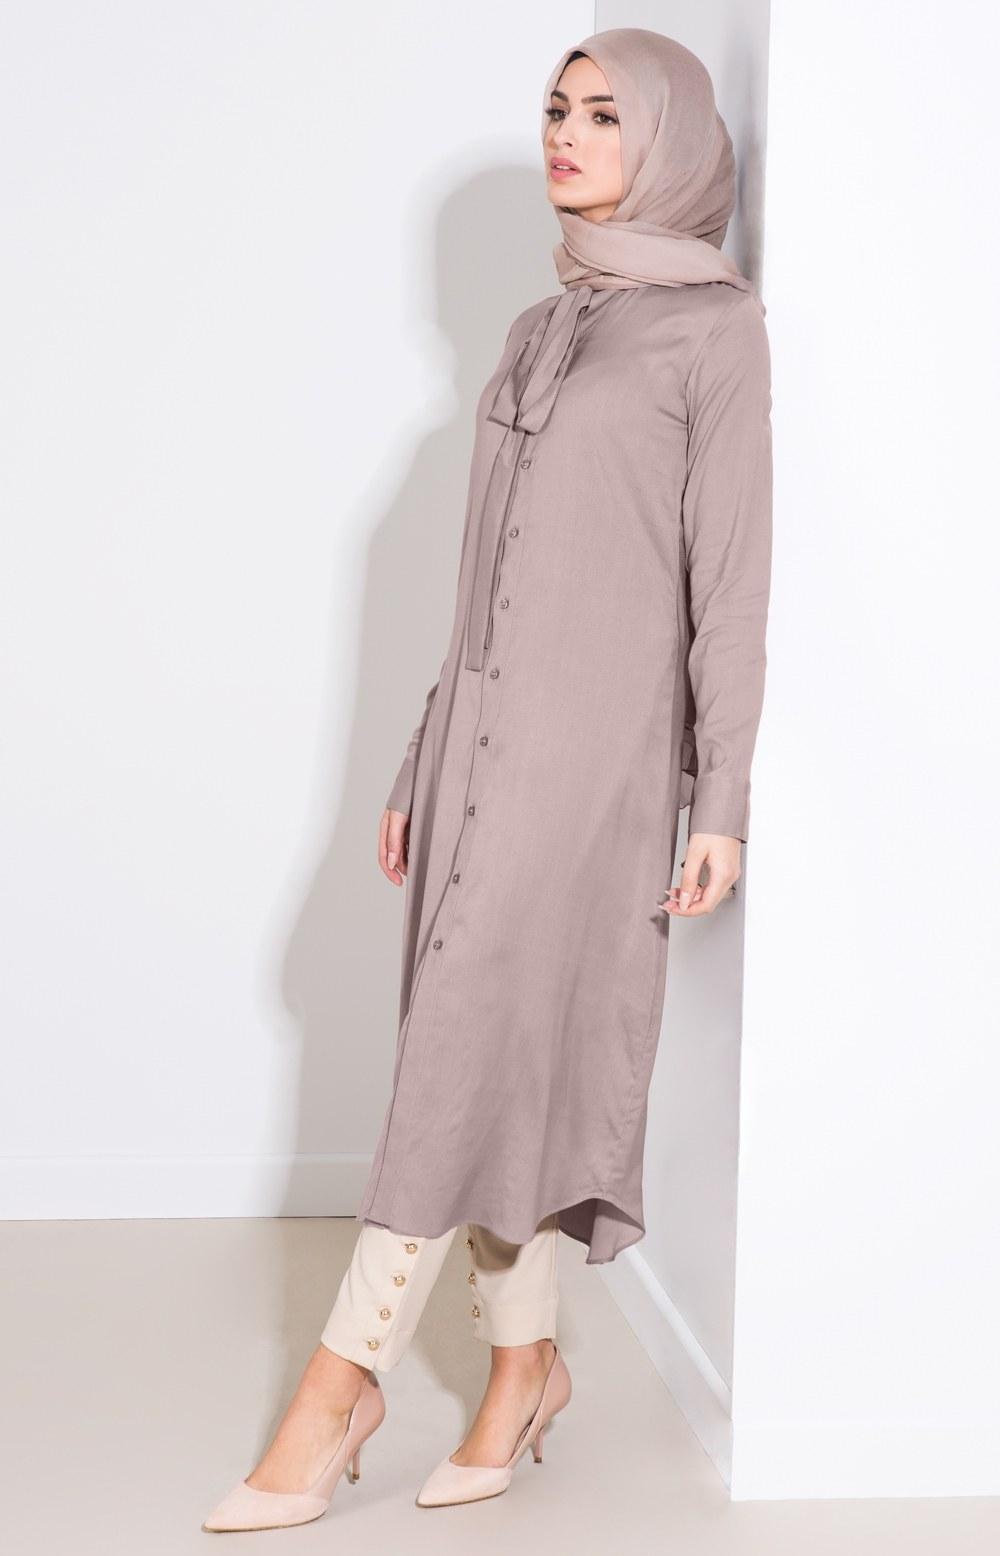 Model Trend Baju Lebaran Tahun Ini Ftd8 25 Trend Model Baju Muslim Lebaran 2018 Simple & Modis